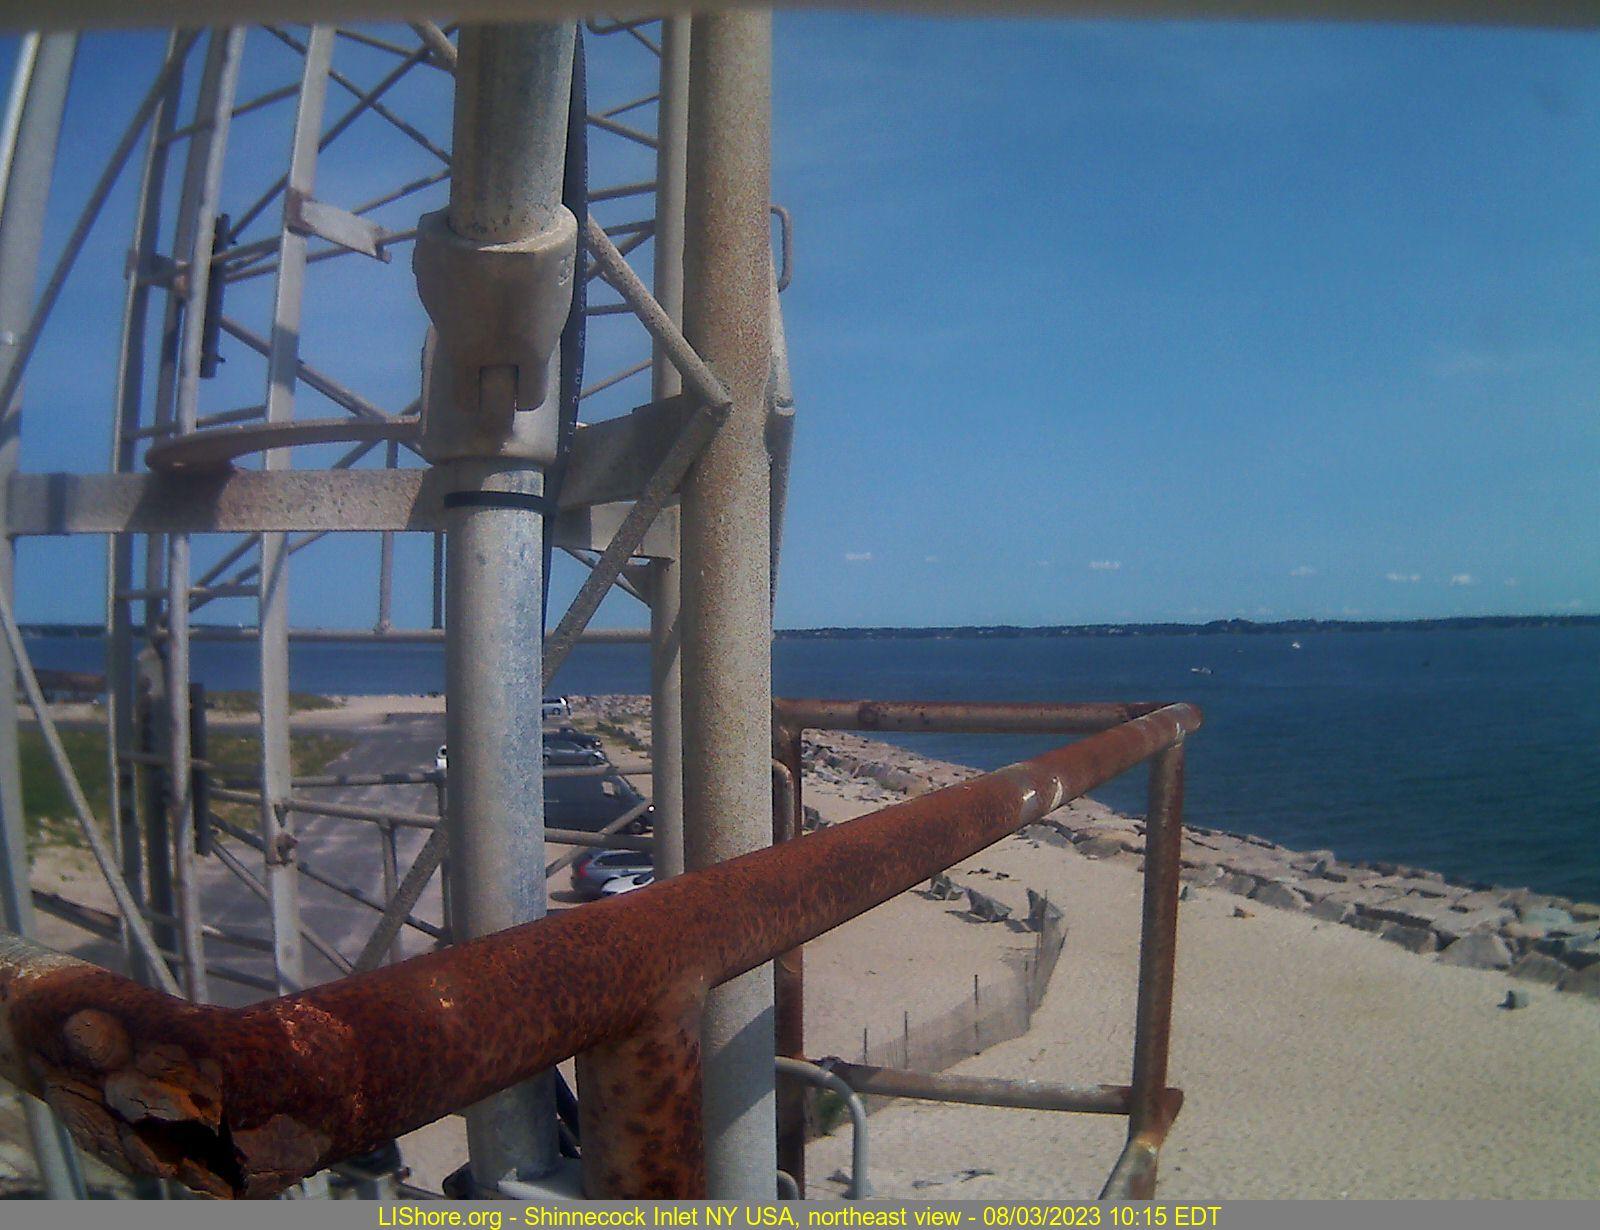 Webcam image - northeast view